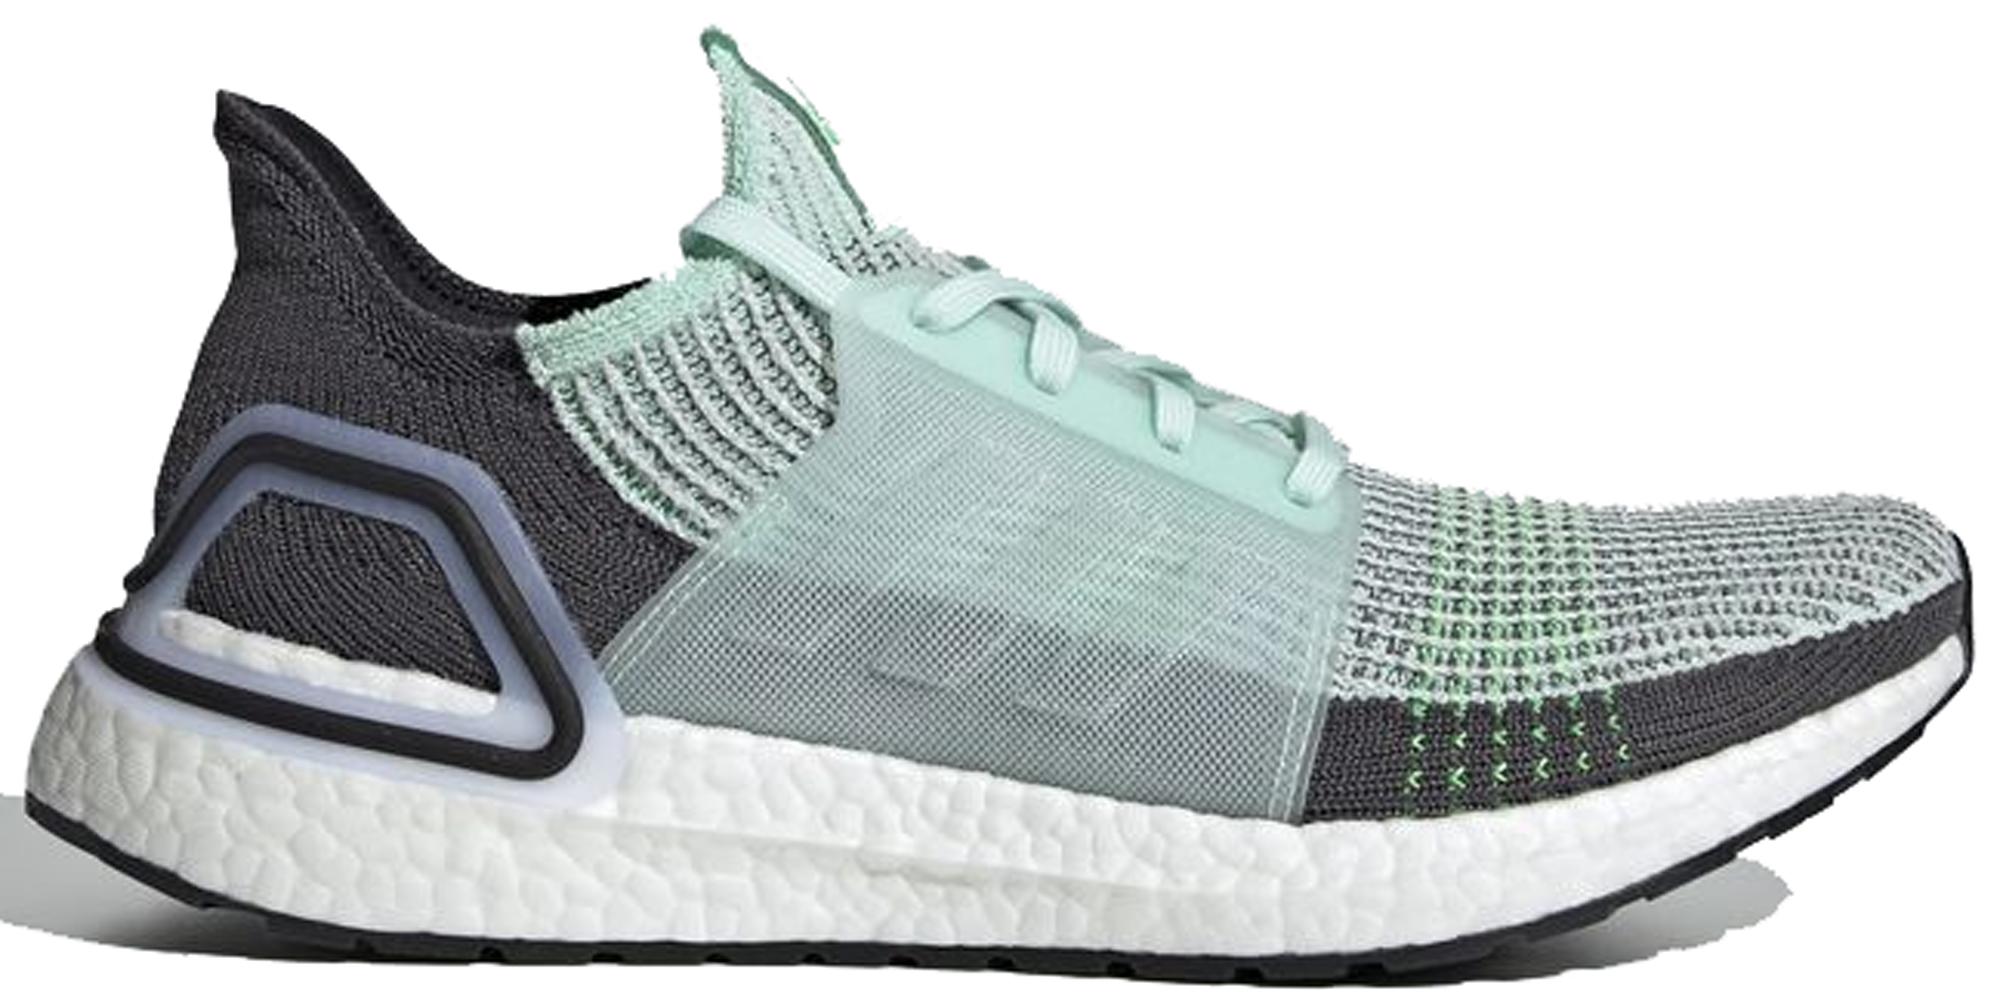 adidas Ultra Boost 19 Ice Mint Grey Six